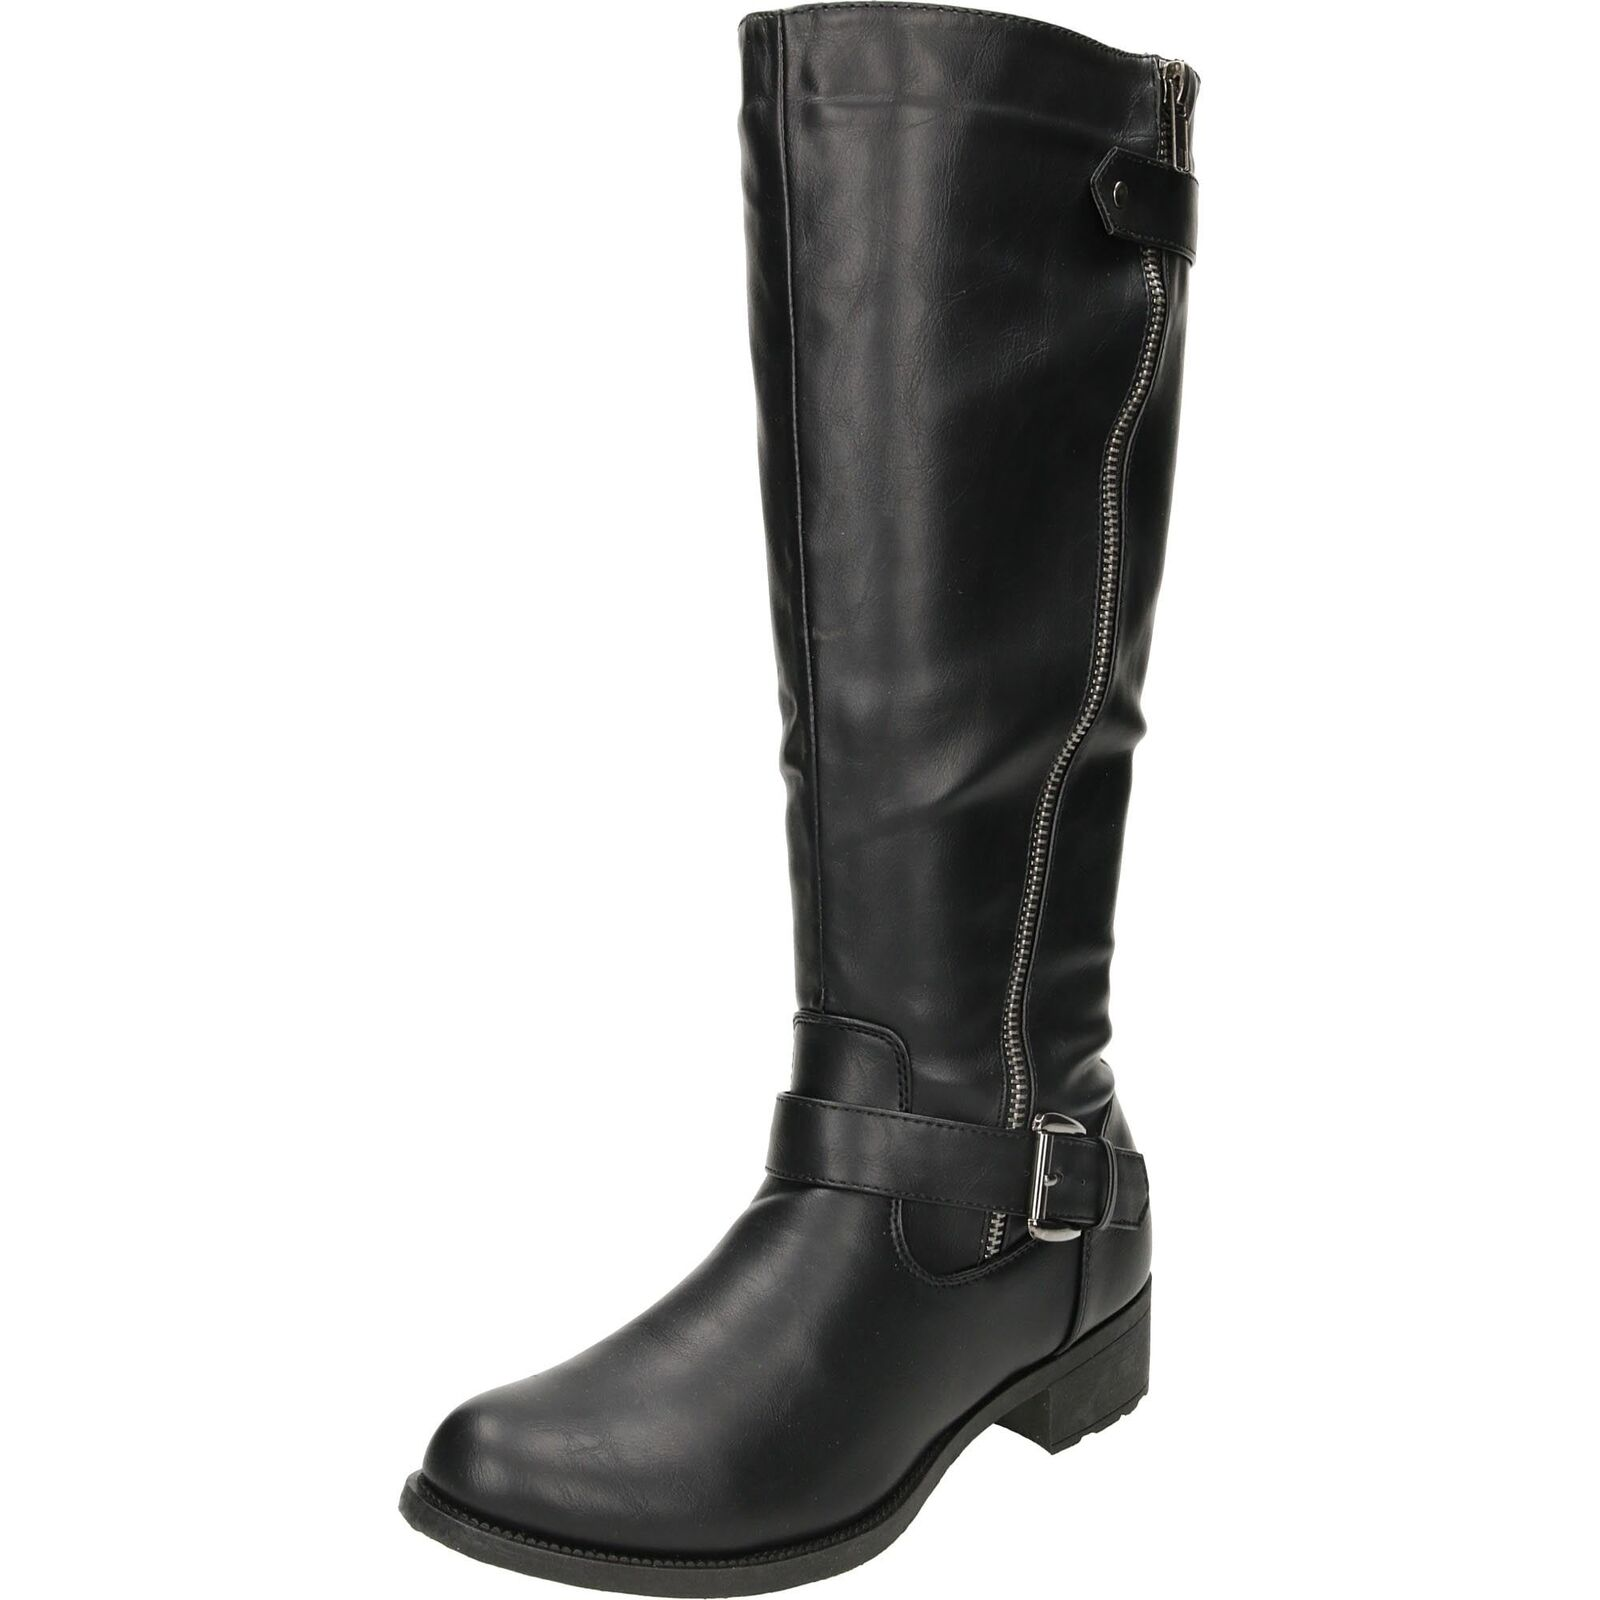 Knee High Flat Boots Riding Style Black Biker Low Heel Zip Ladies Shoe Gothic